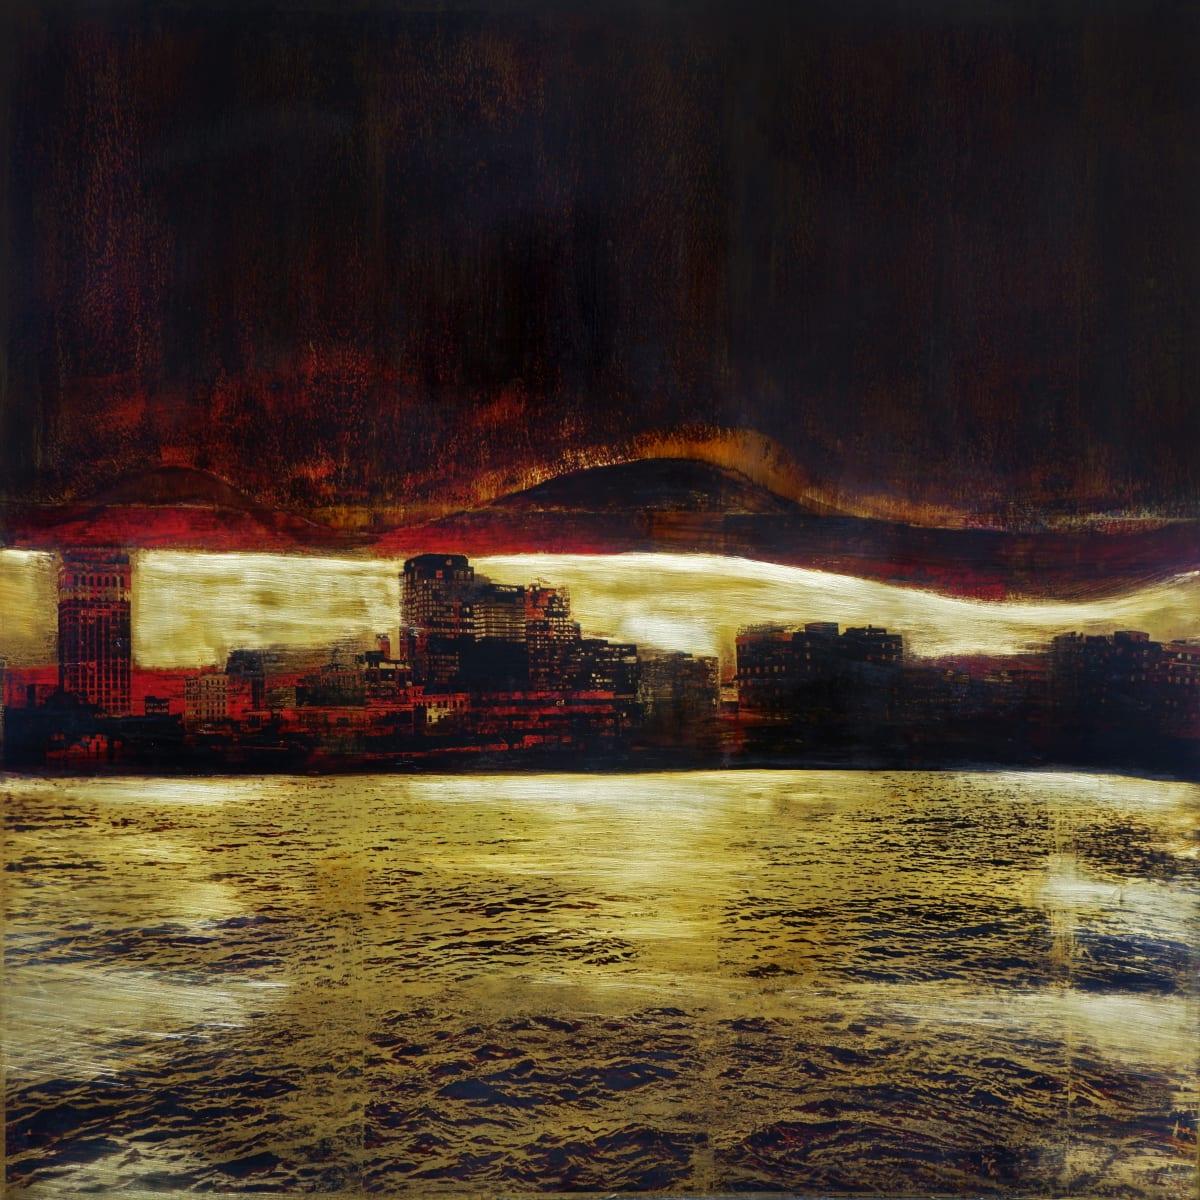 Etza Meisyara, Eternal Duality, 2020